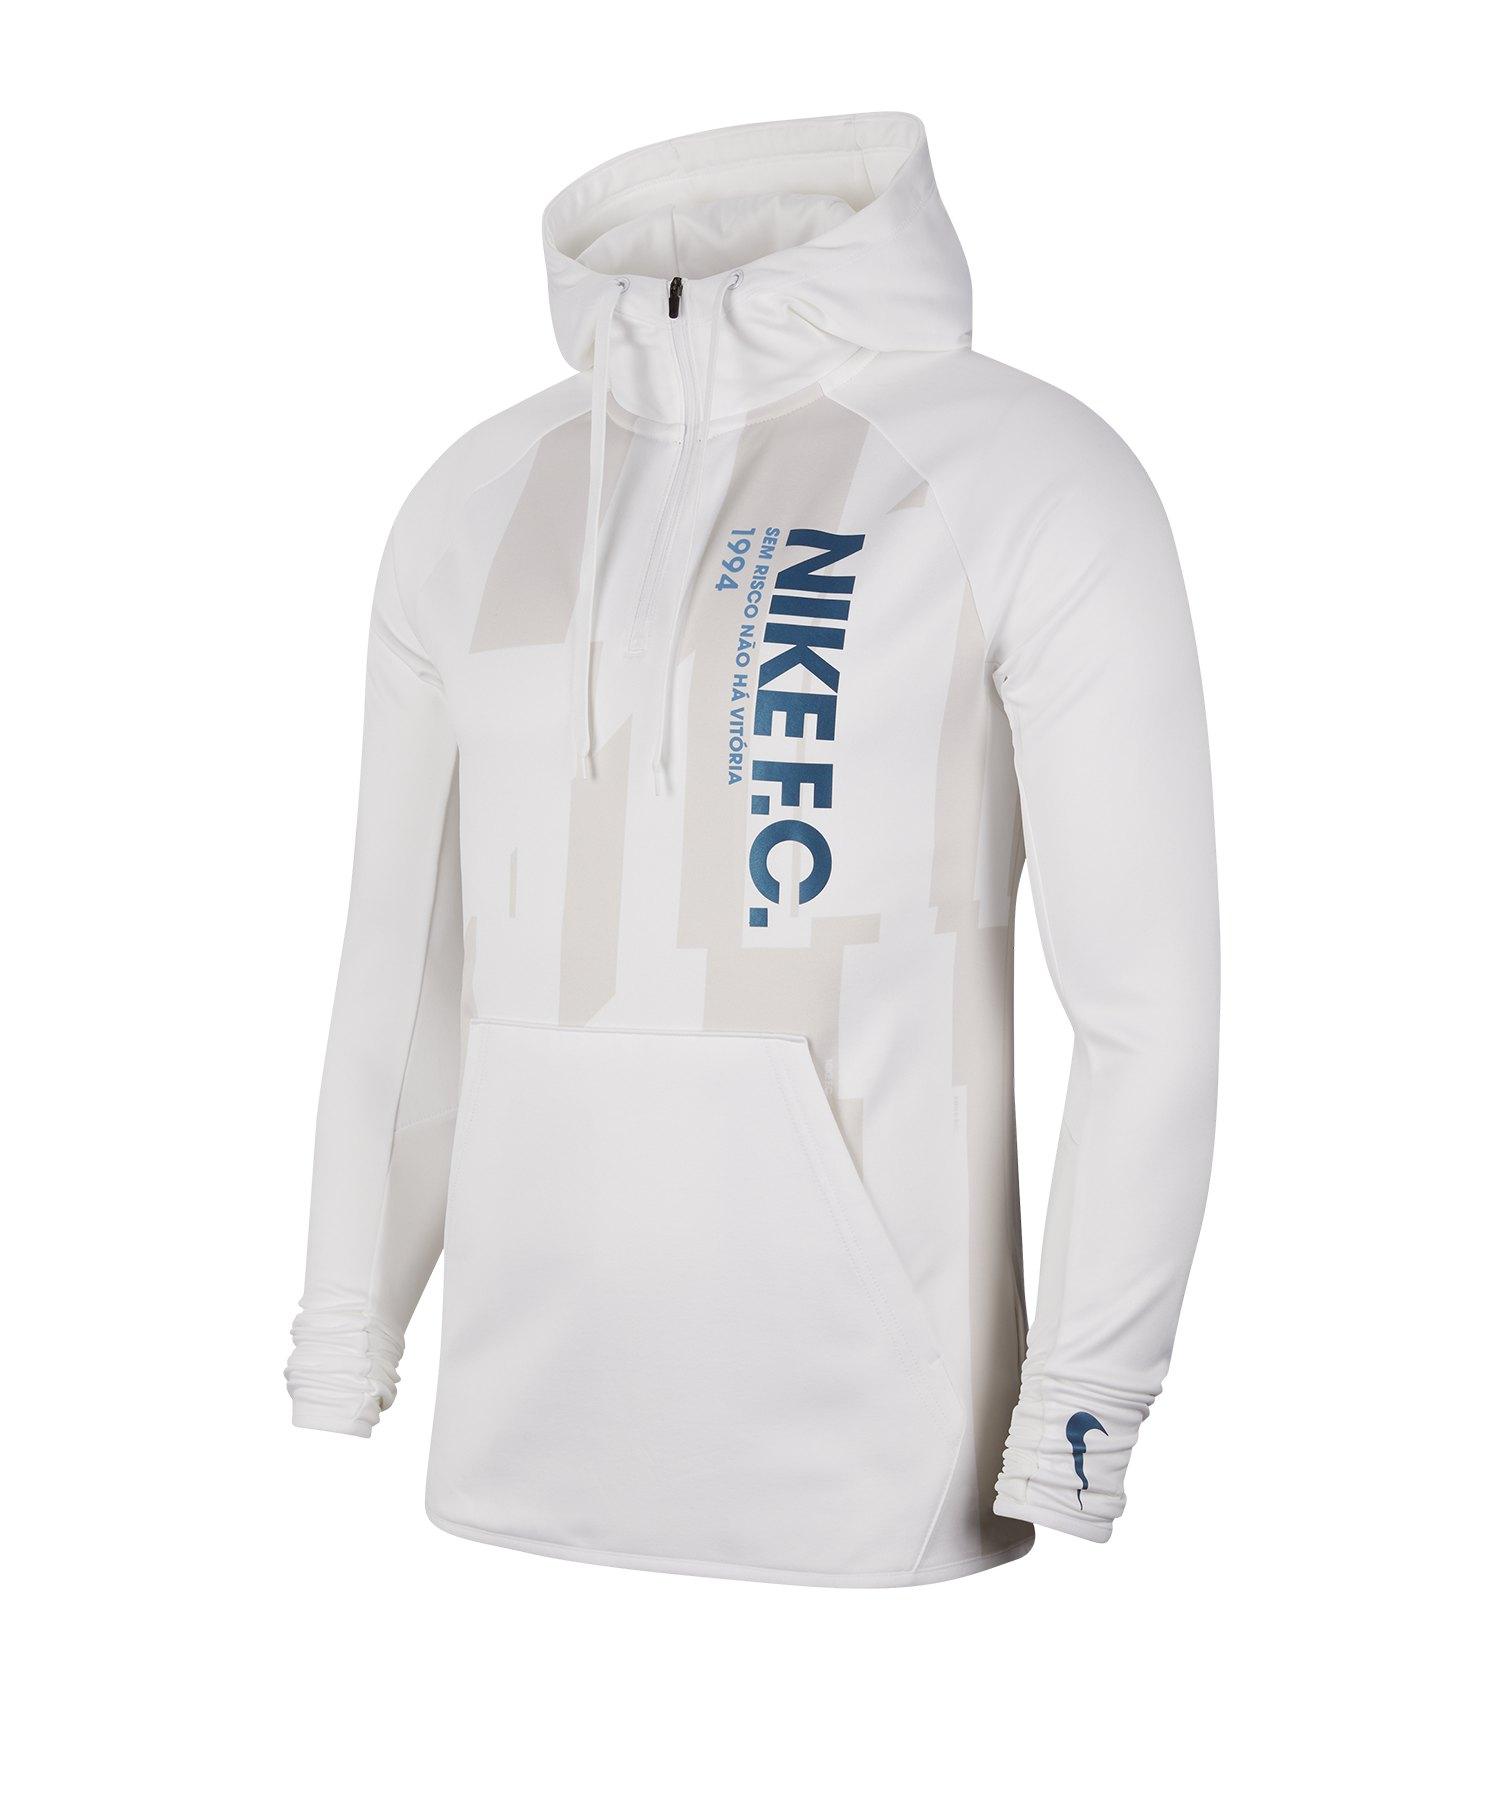 Nike F.C. Hoody Kapuzensweatshirt Weiss F100 - weiss